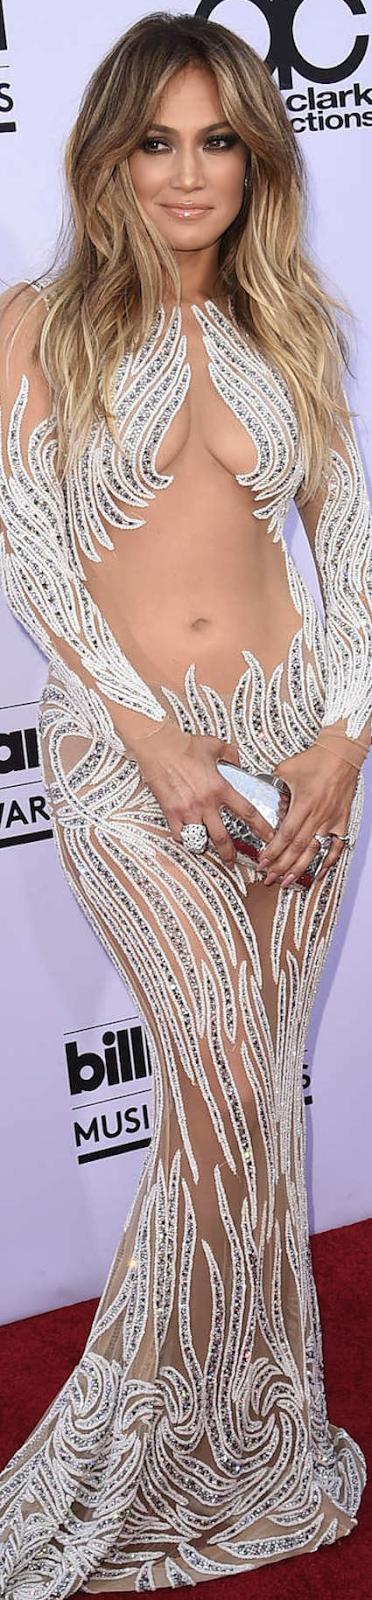 2015 Billboard Awards Jennifer Lopez